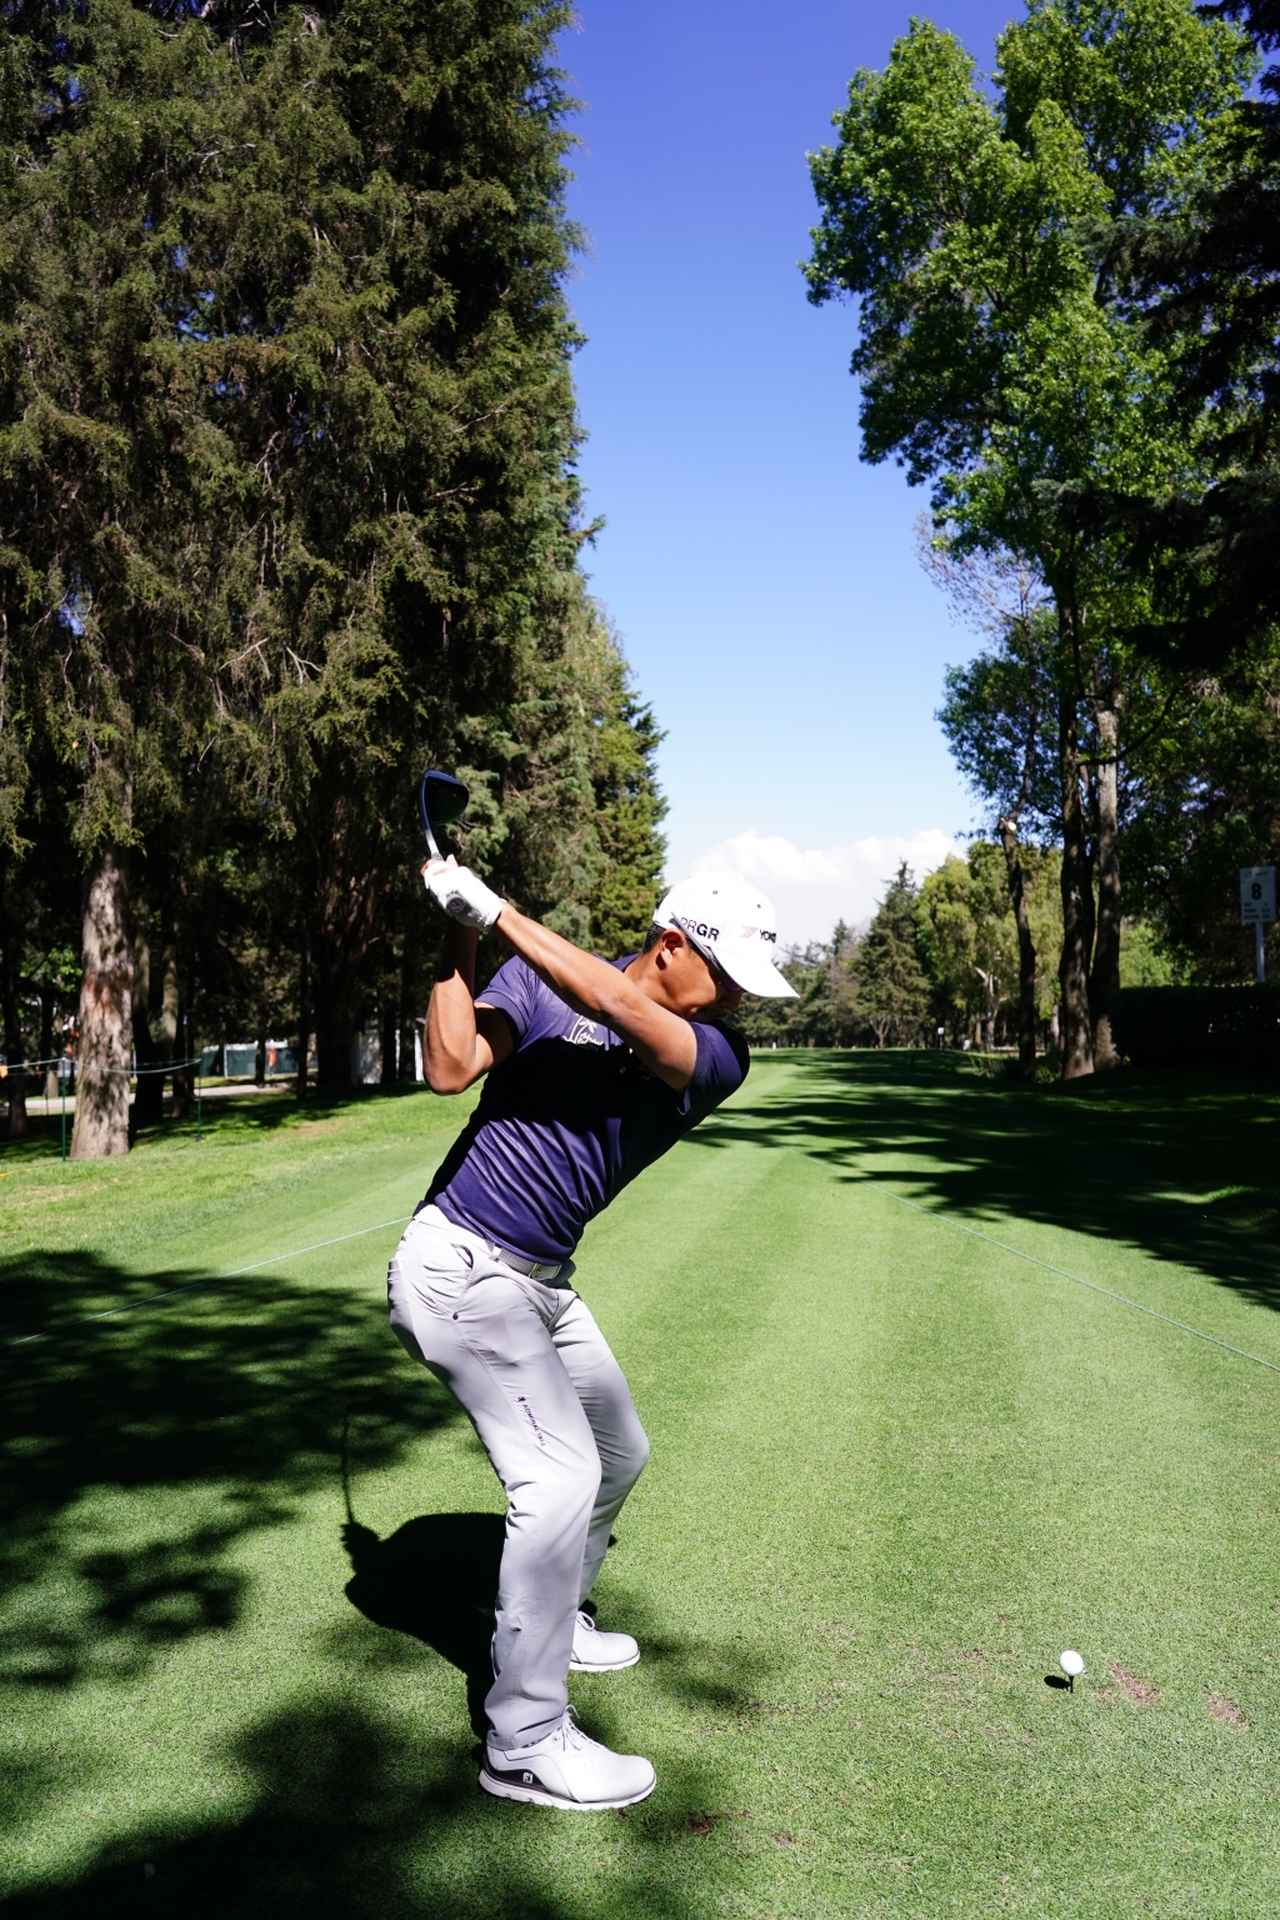 Images : 6番目の画像 - 小平智のドライバー連続写真 - みんなのゴルフダイジェスト